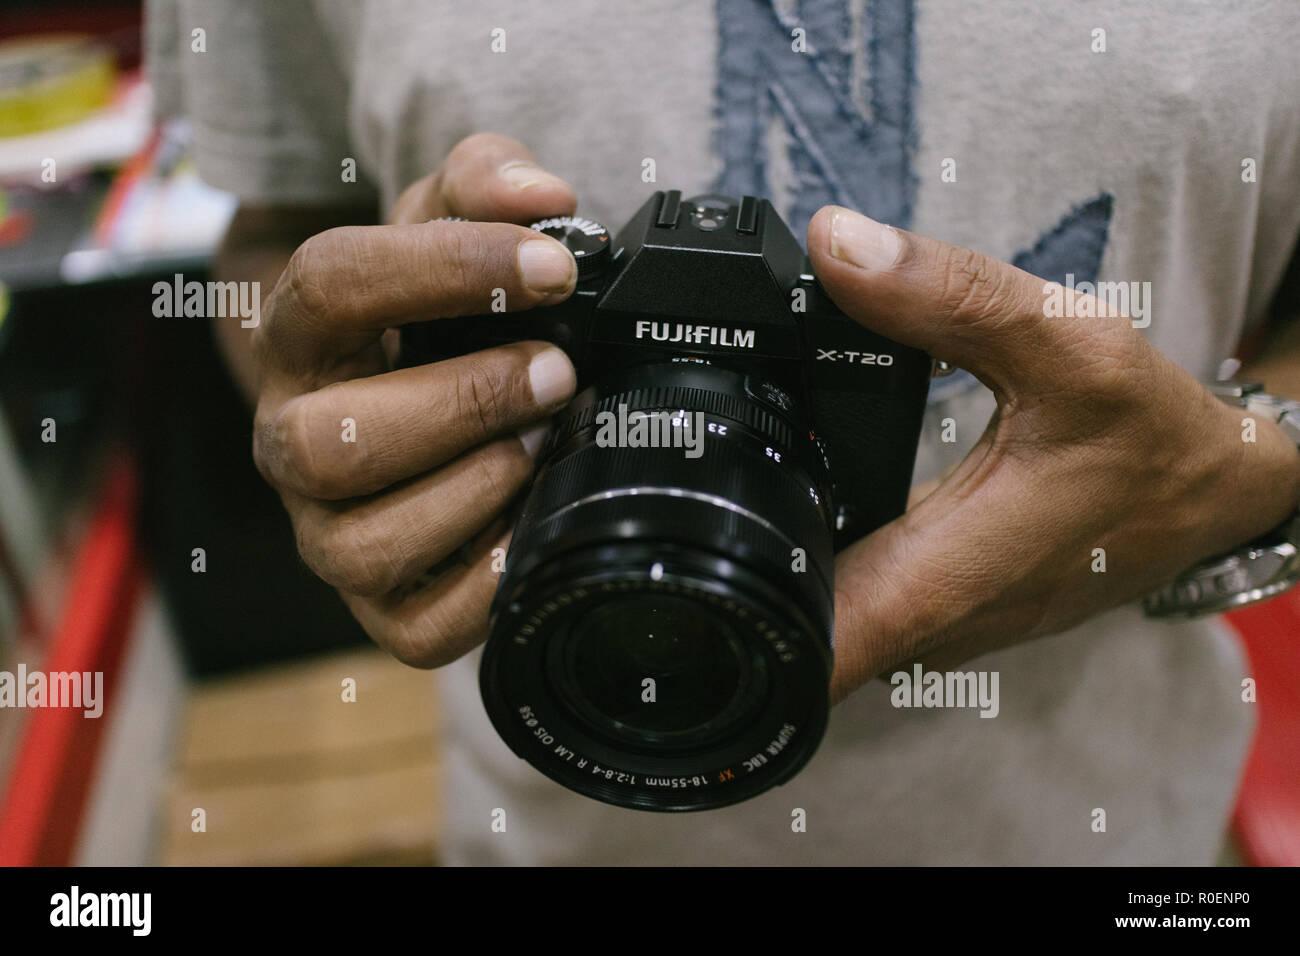 Indian customer checks brand new fujifilm X-t20 mirrorless camera at a camera store in Hyderabad,India - Stock Image